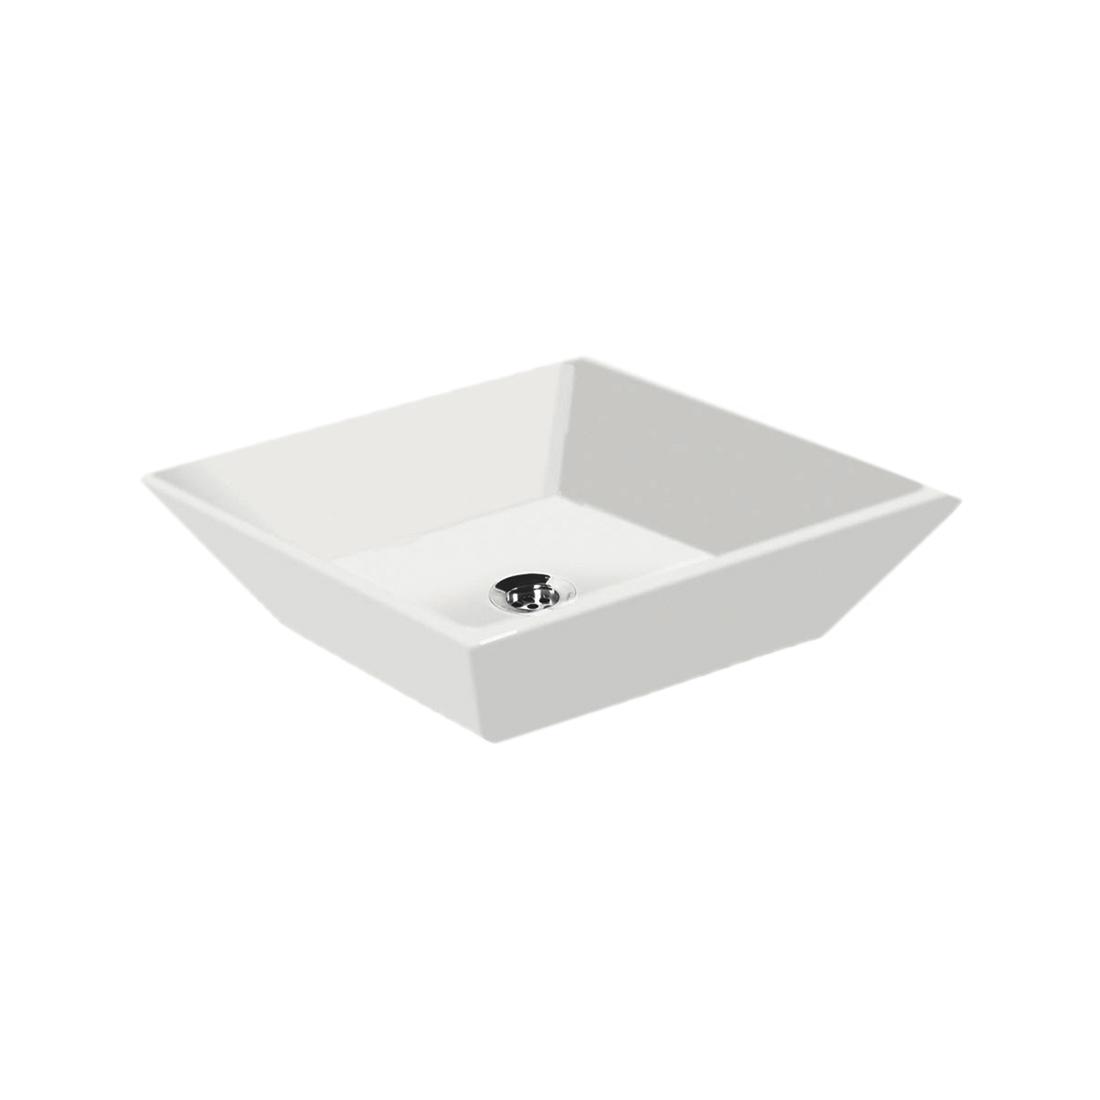 Kerovit Kacia KB161 Counter Top Wash Basin